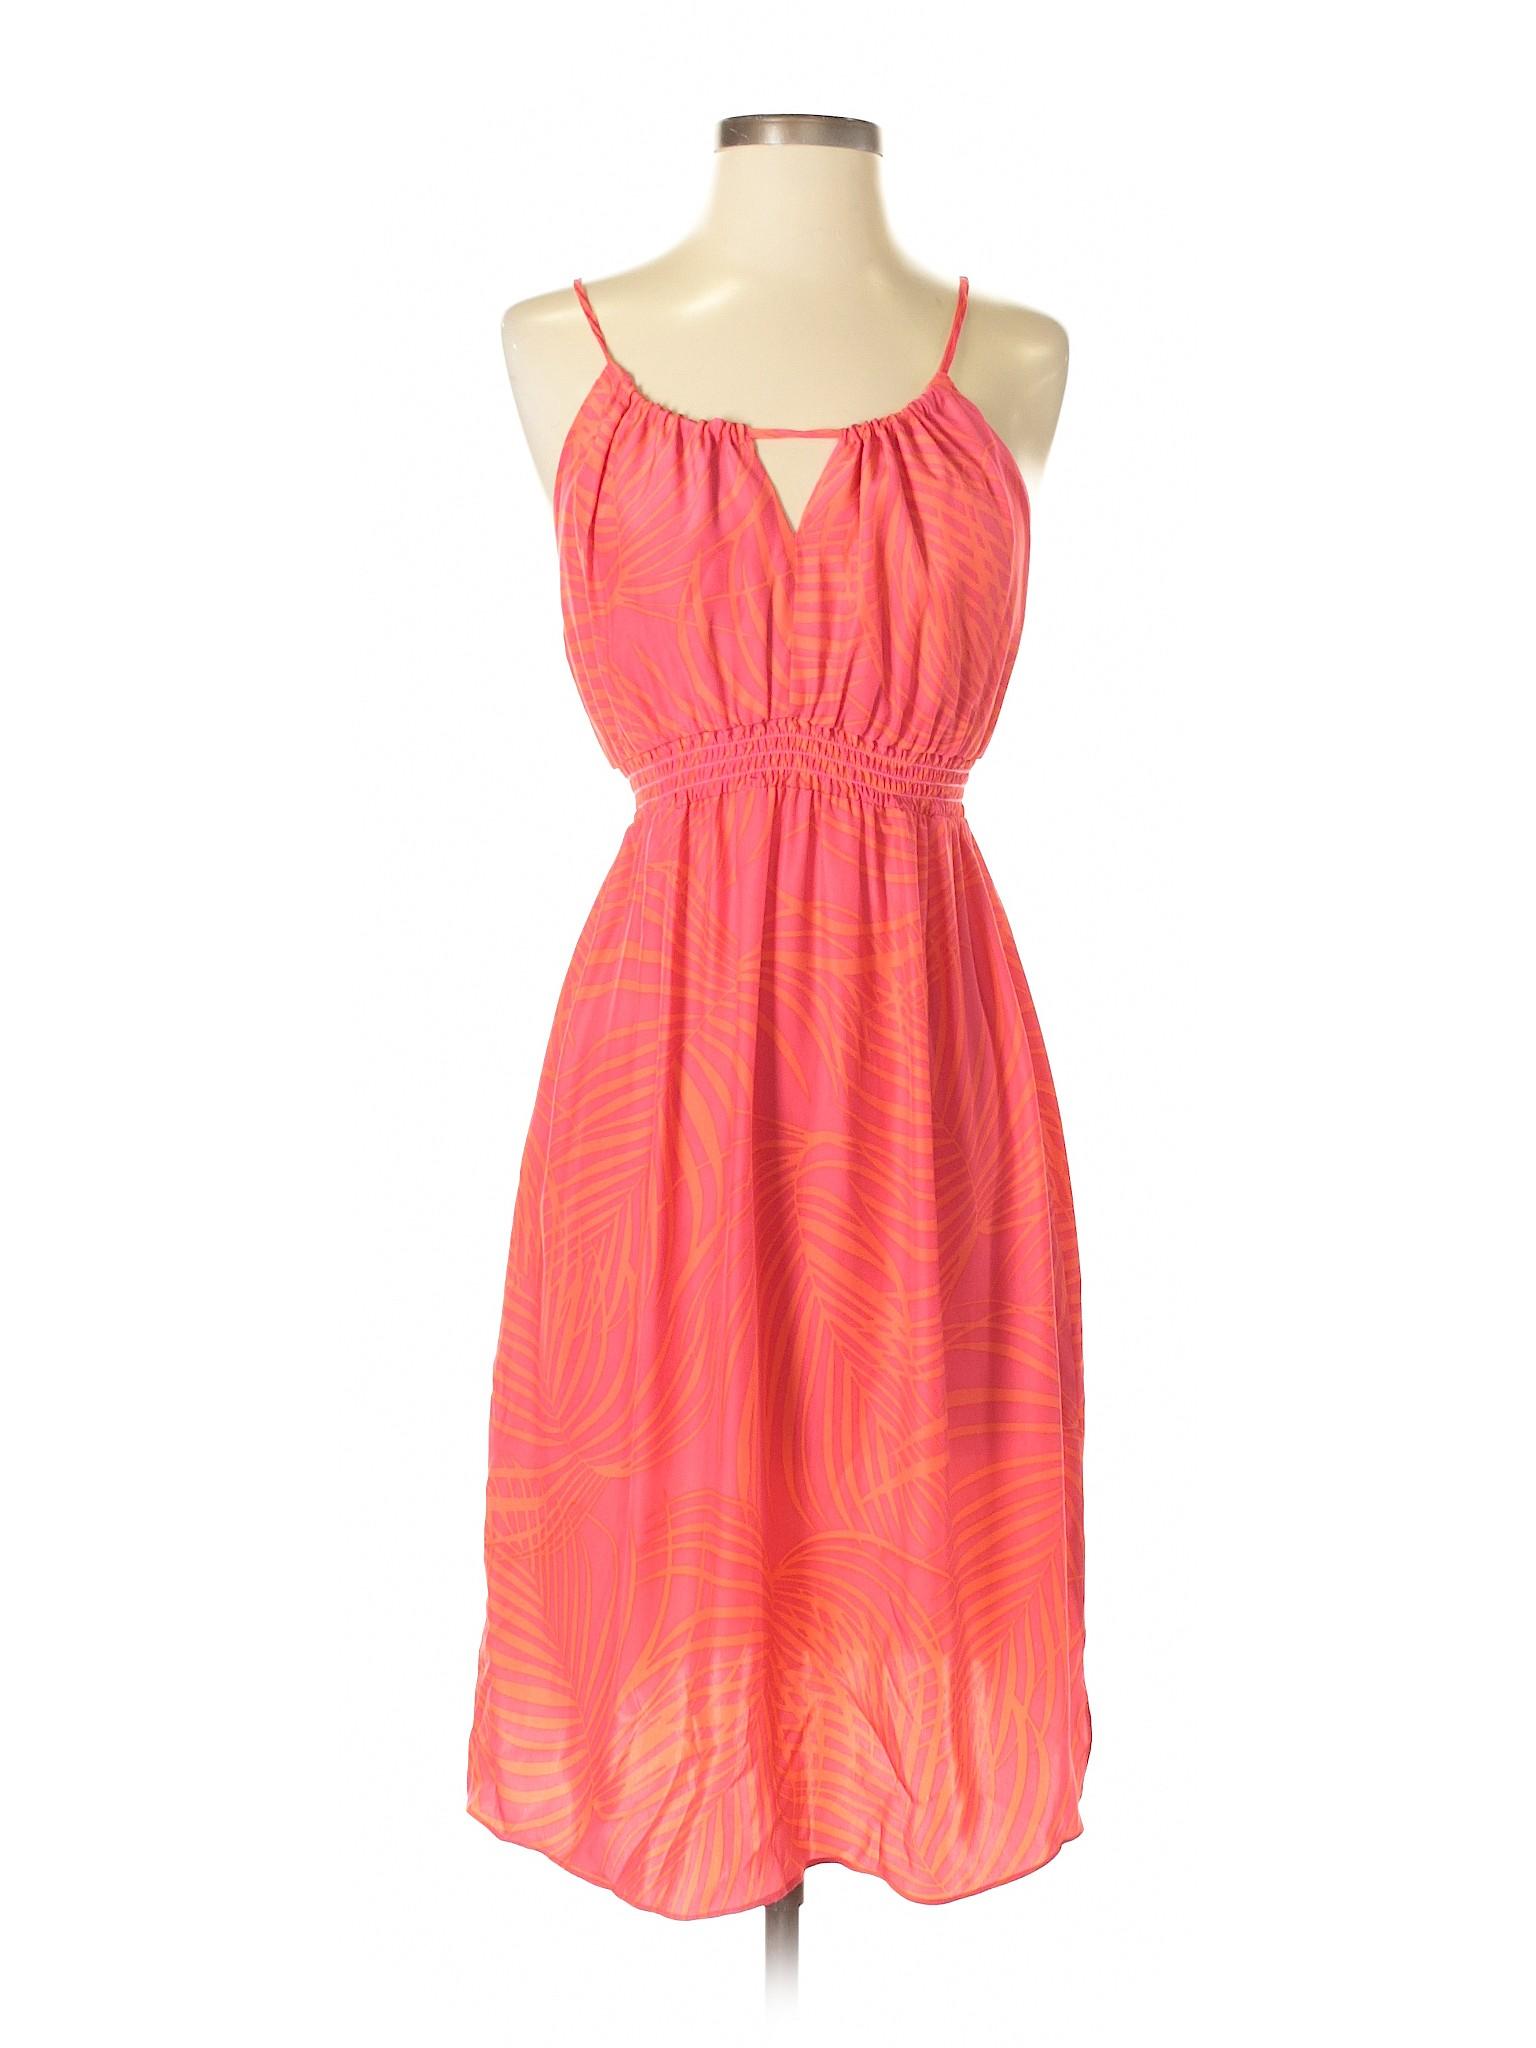 Casual winter Liquid New York Dress Boutique dIp41wIq